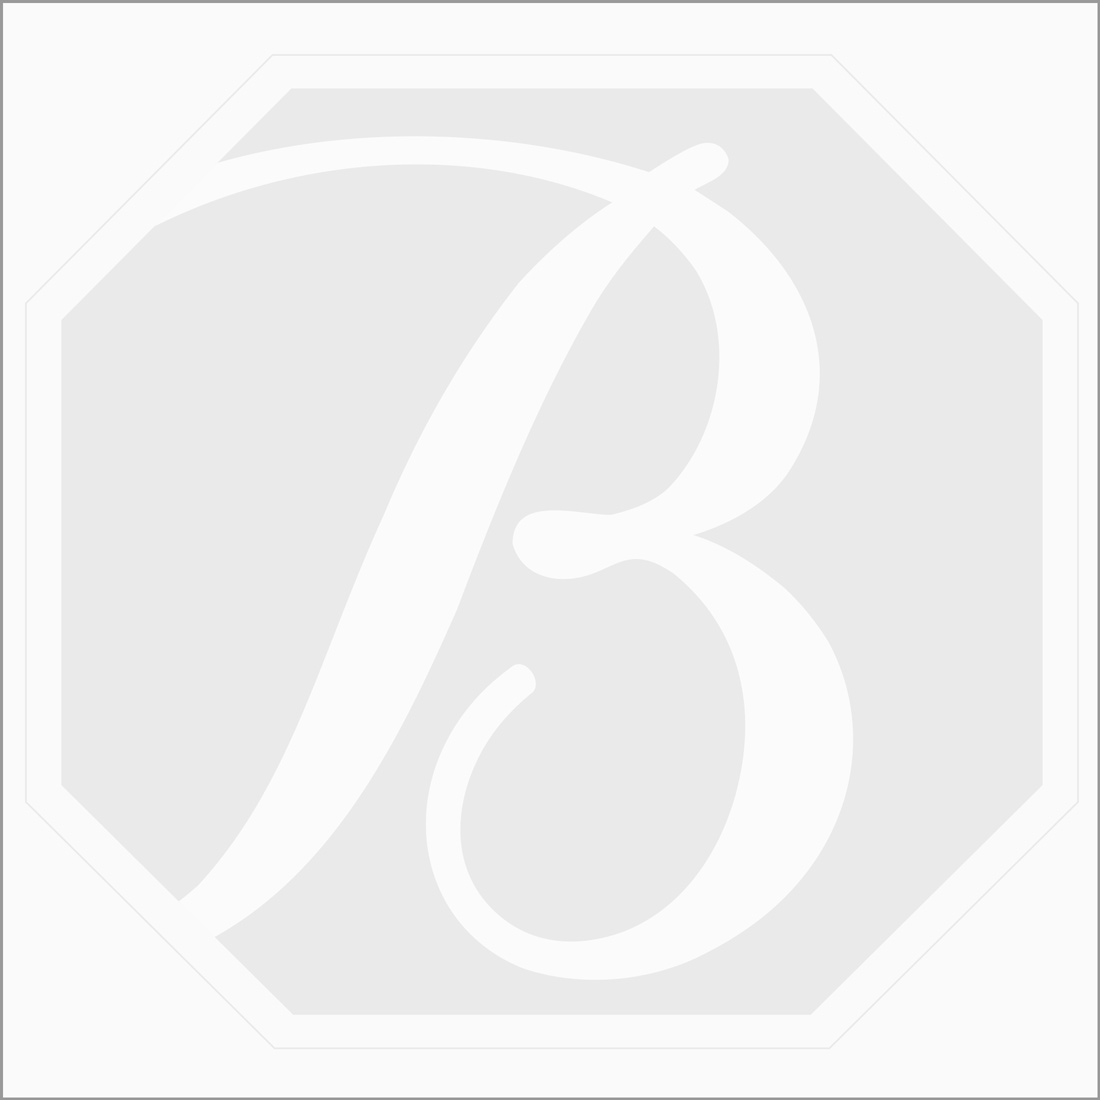 2 Brown Diamond Cushion Shape Rose Cut Diamonds - 5.87 cts. (DRC1229)